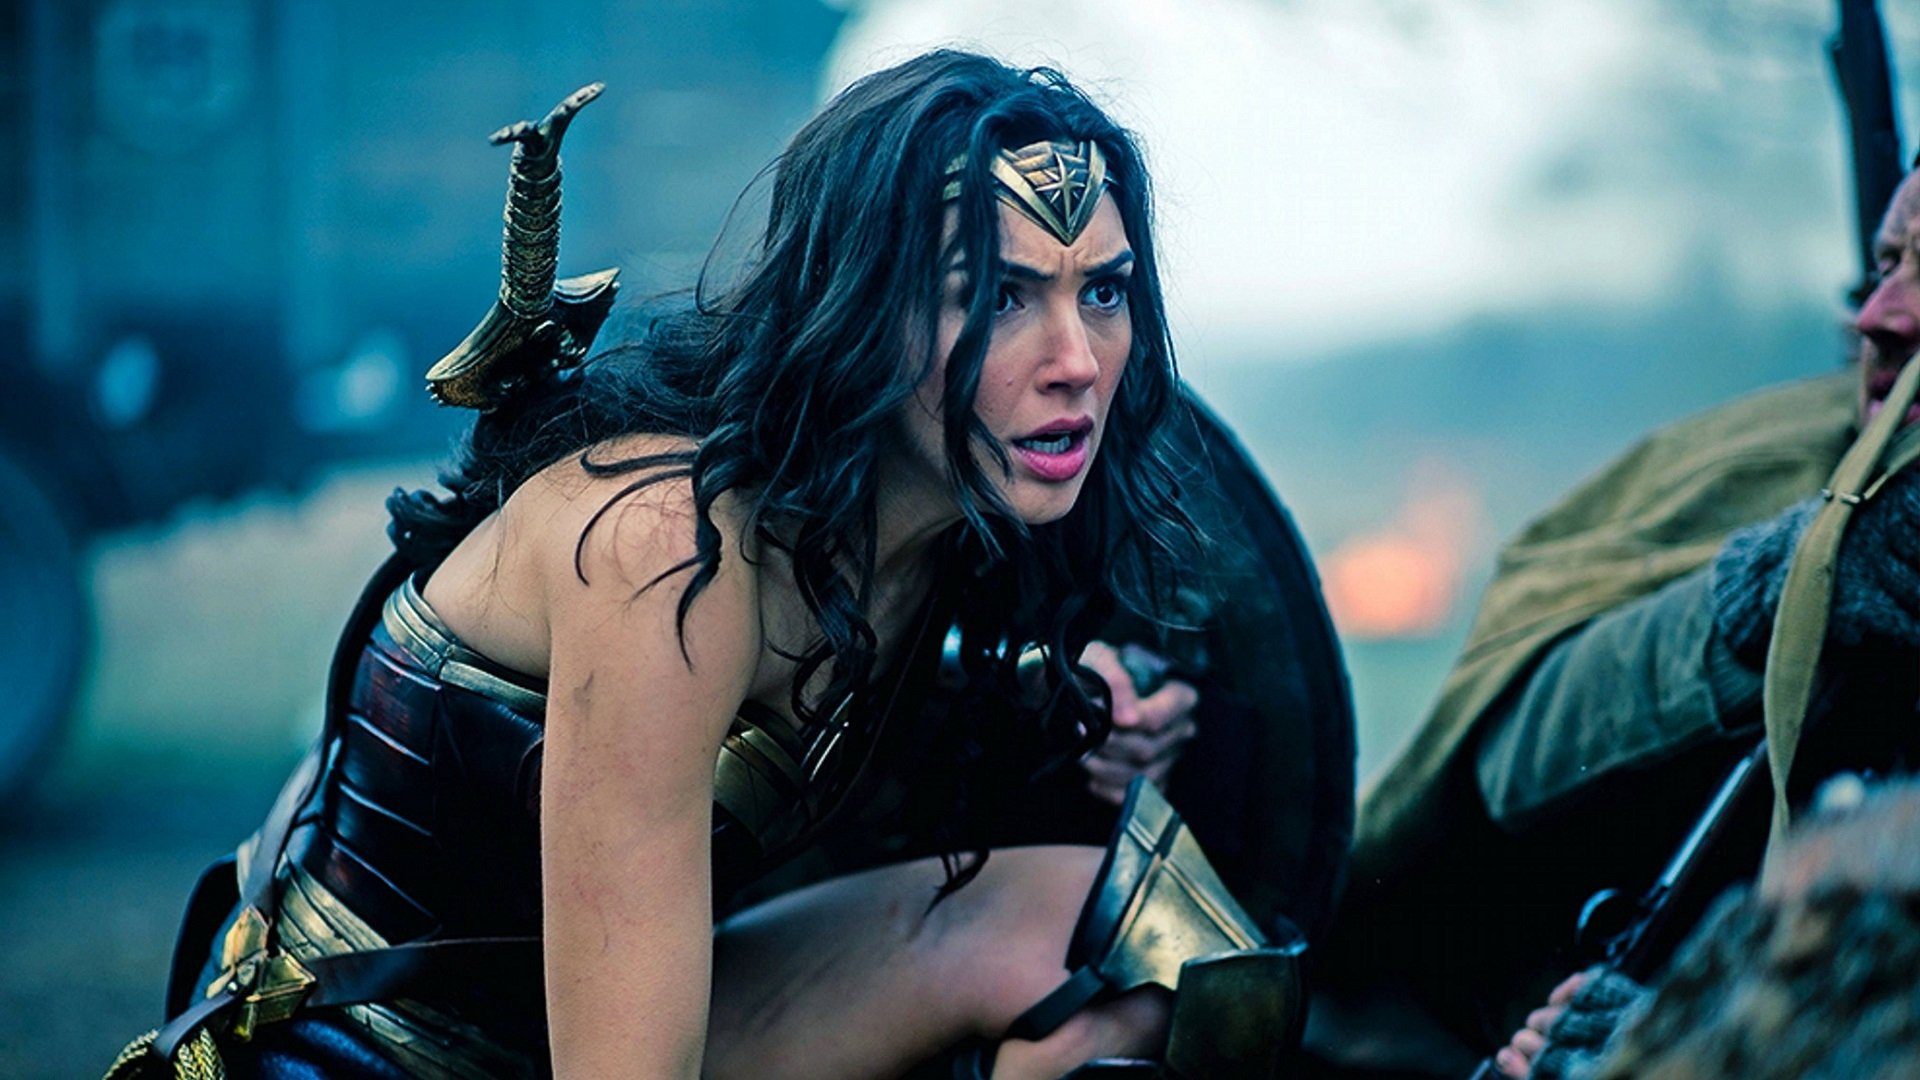 Wonder Woman Hq Movie Wallpapers: Wonder Woman HD Wallpaper